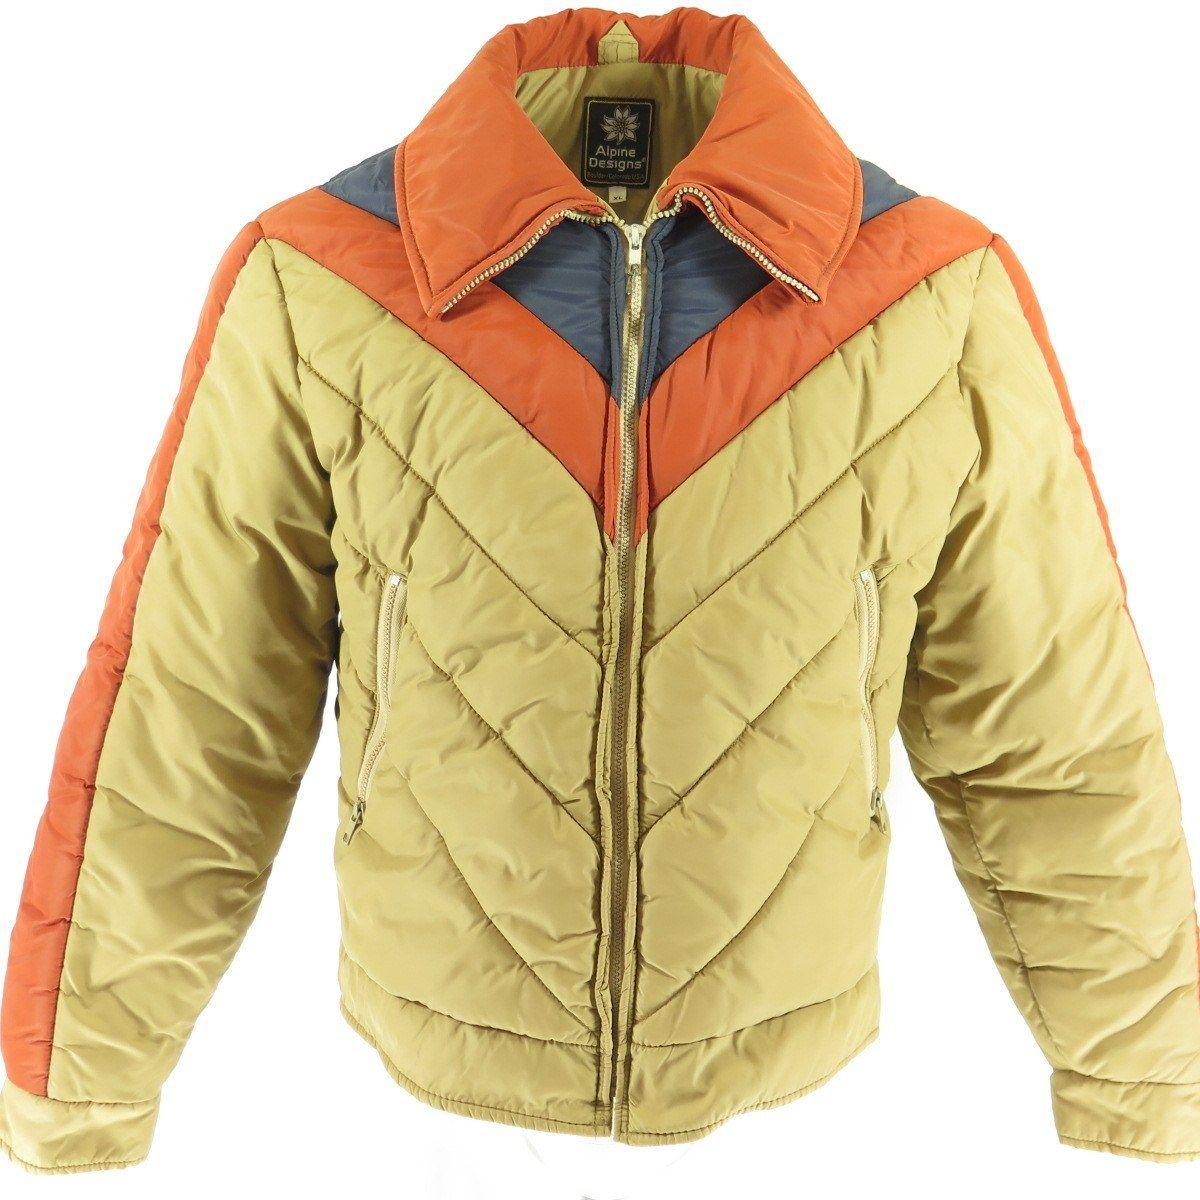 77b3ca8be22 Vtg 80s Alpine Designs Puffy Puffer Ski Winter Jacket Mens Retro XL ...